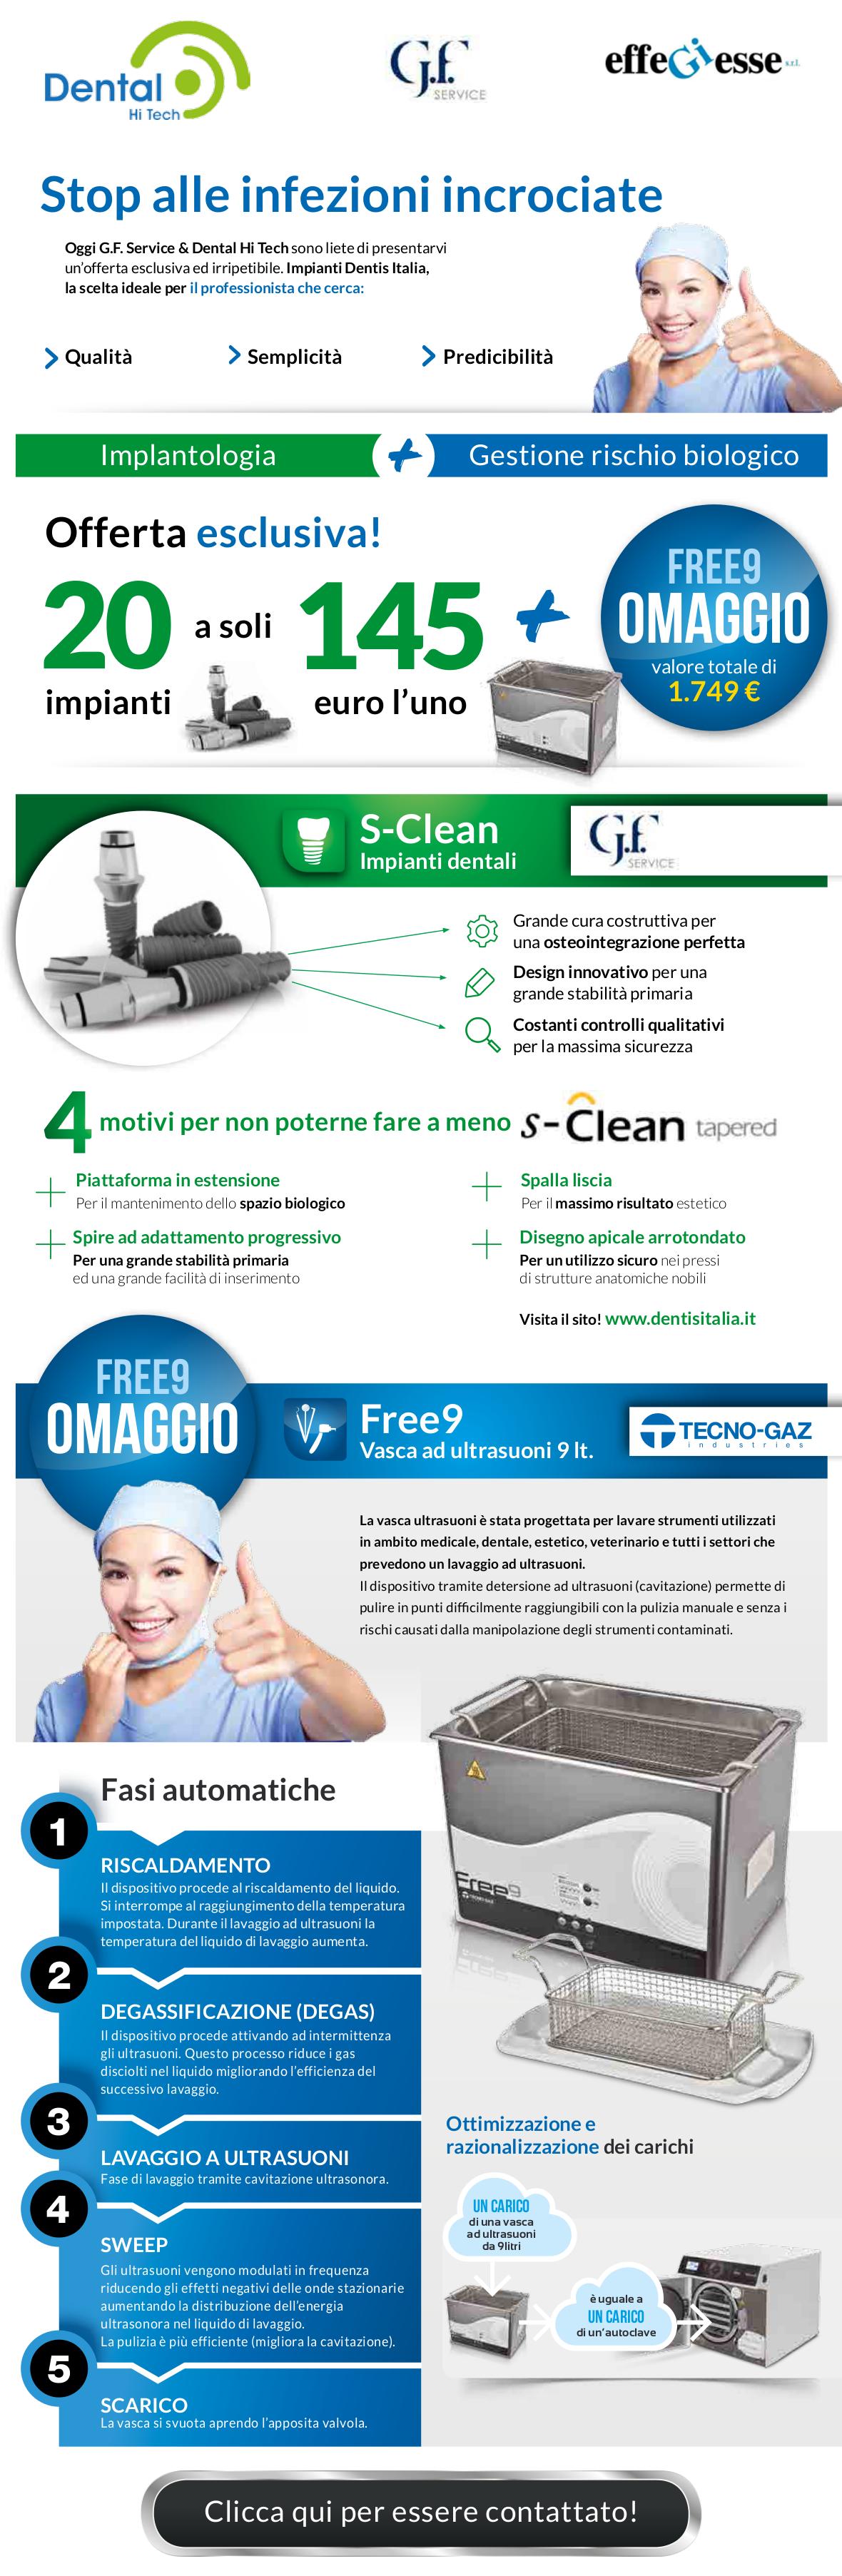 dentis-offerta9